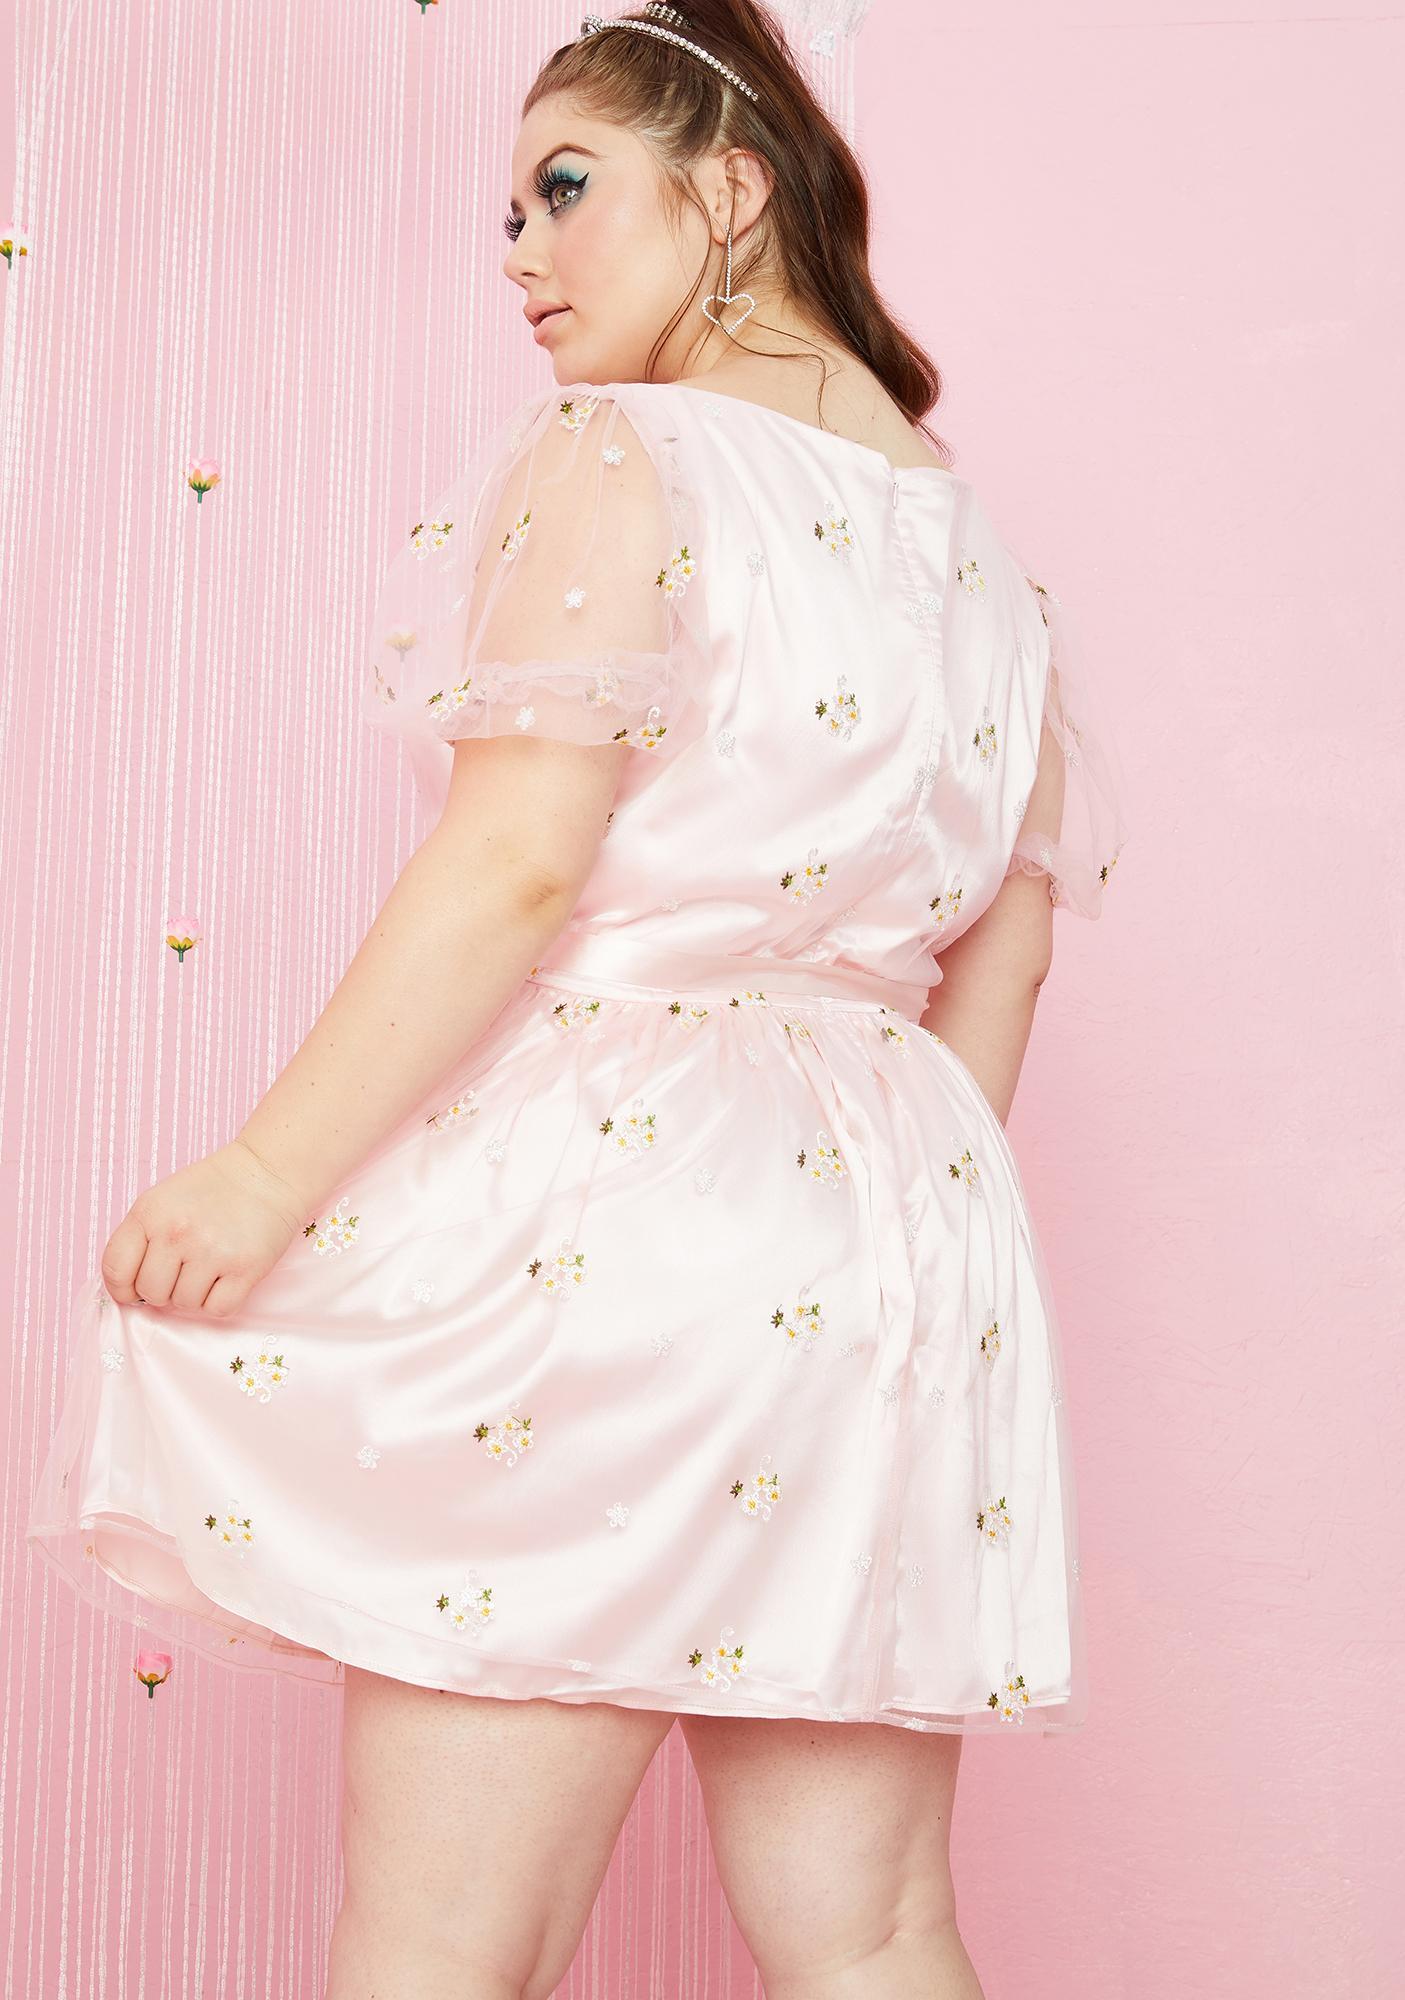 Sugar Thrillz Real Starlet Daze Babydoll Dress